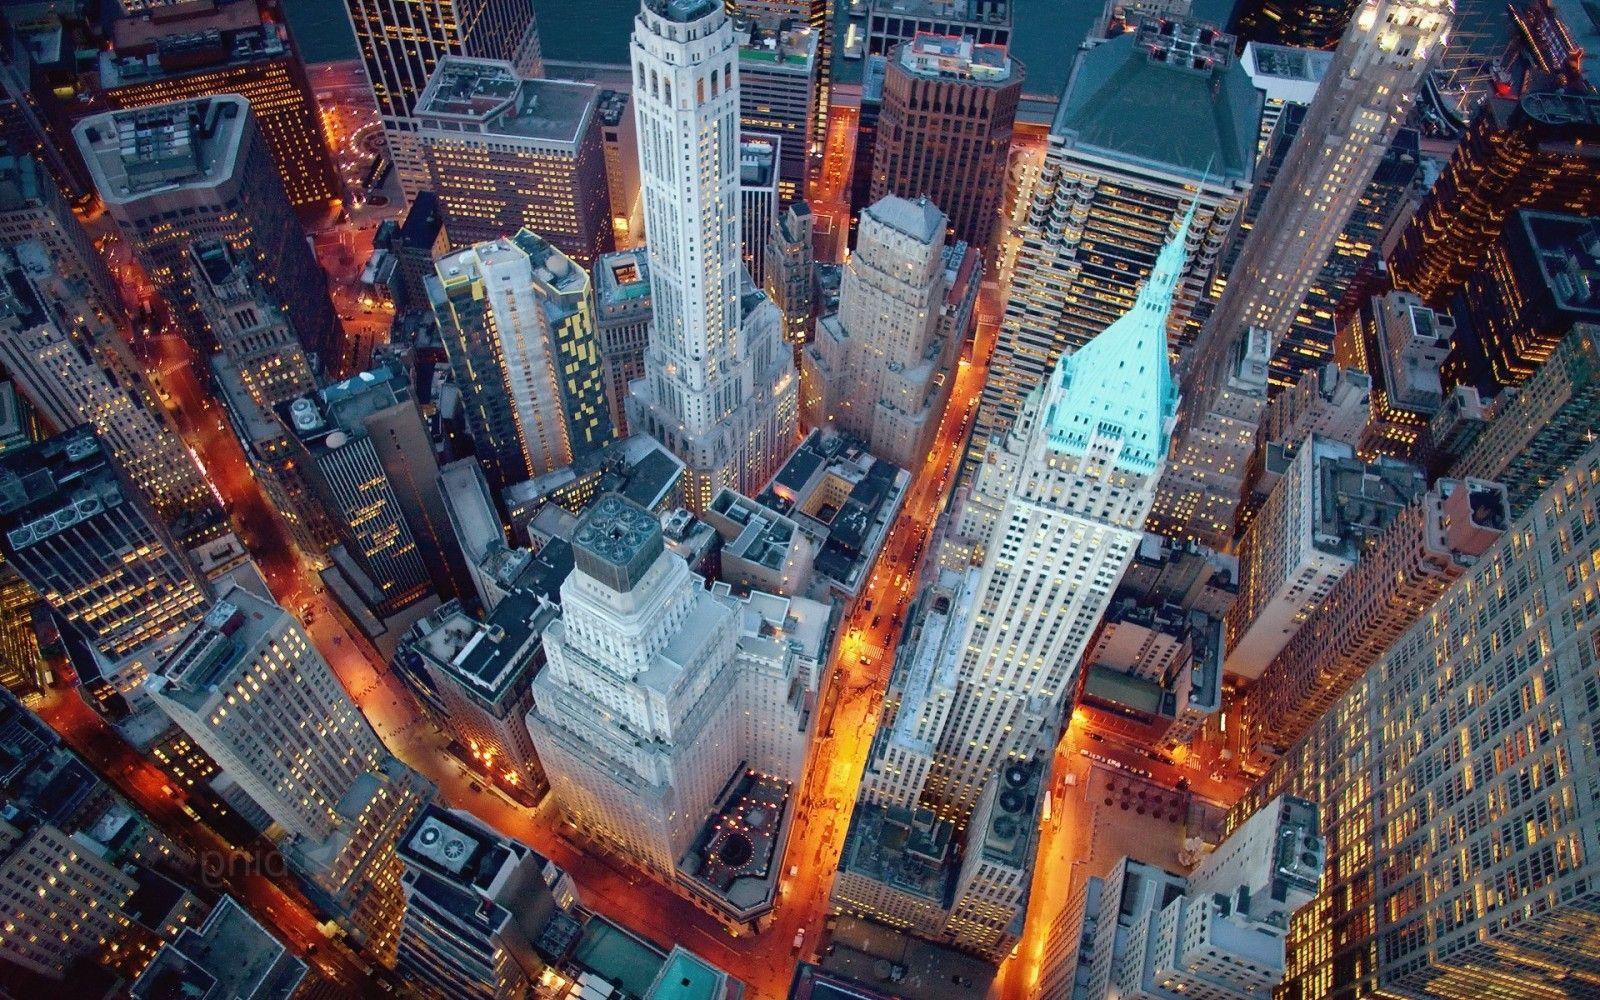 New York City Night Aerial View Wallpaper Aerial View New York Wallpaper Nightscape